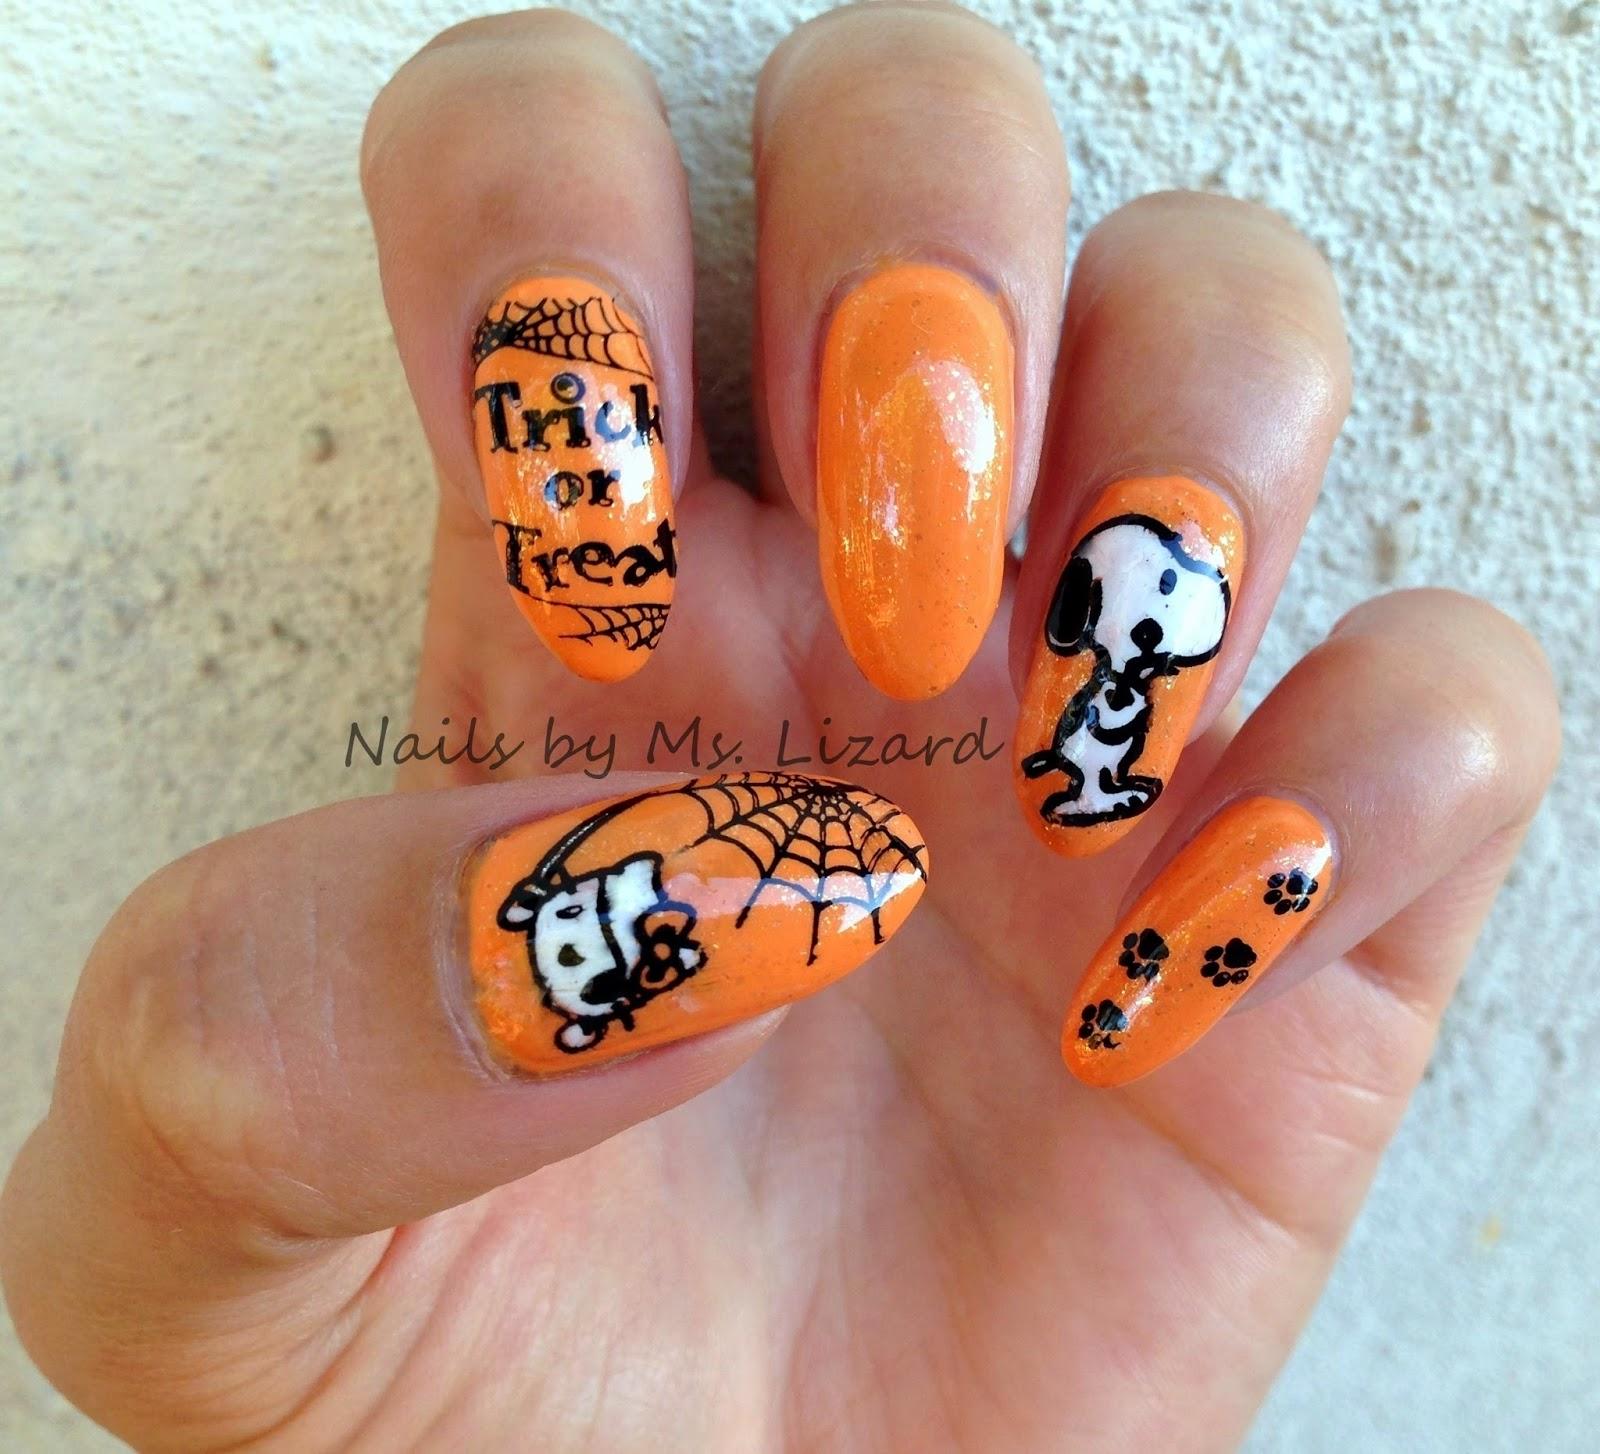 Nails by Ms. Lizard: Halloween Nail Art Ideas